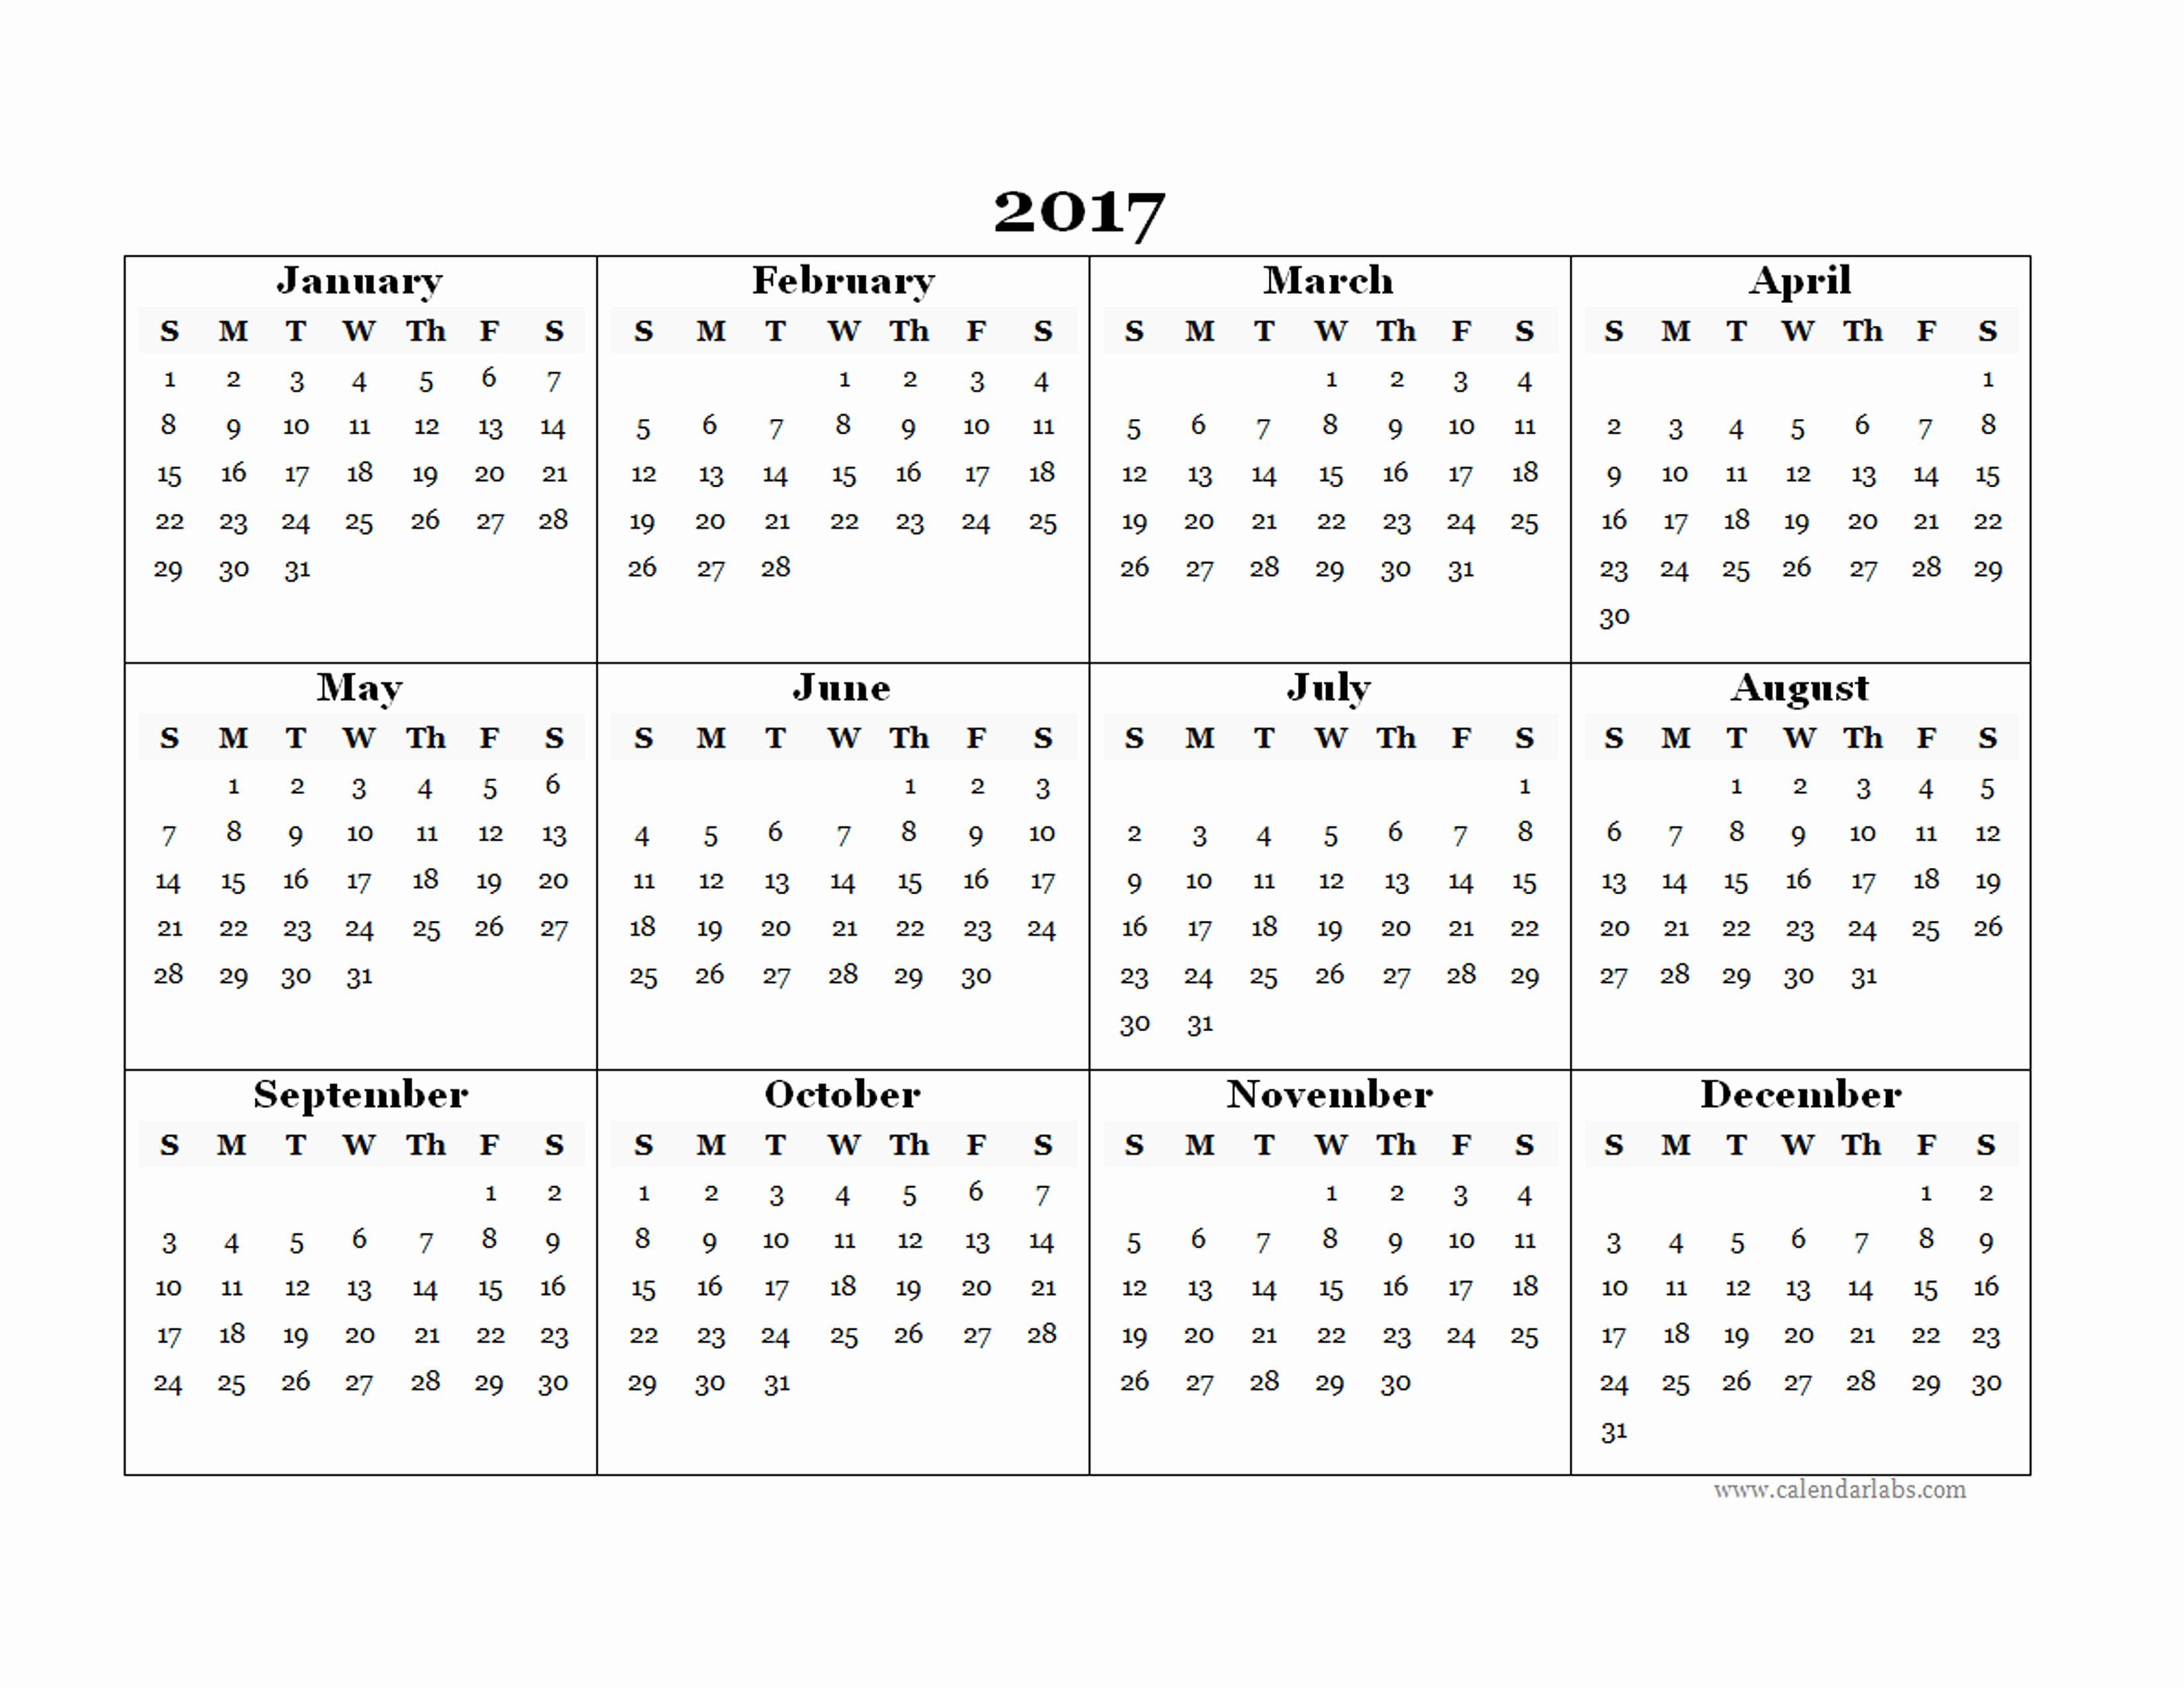 2017 Calendar Template Word Document Awesome Word Calendar Template 2017